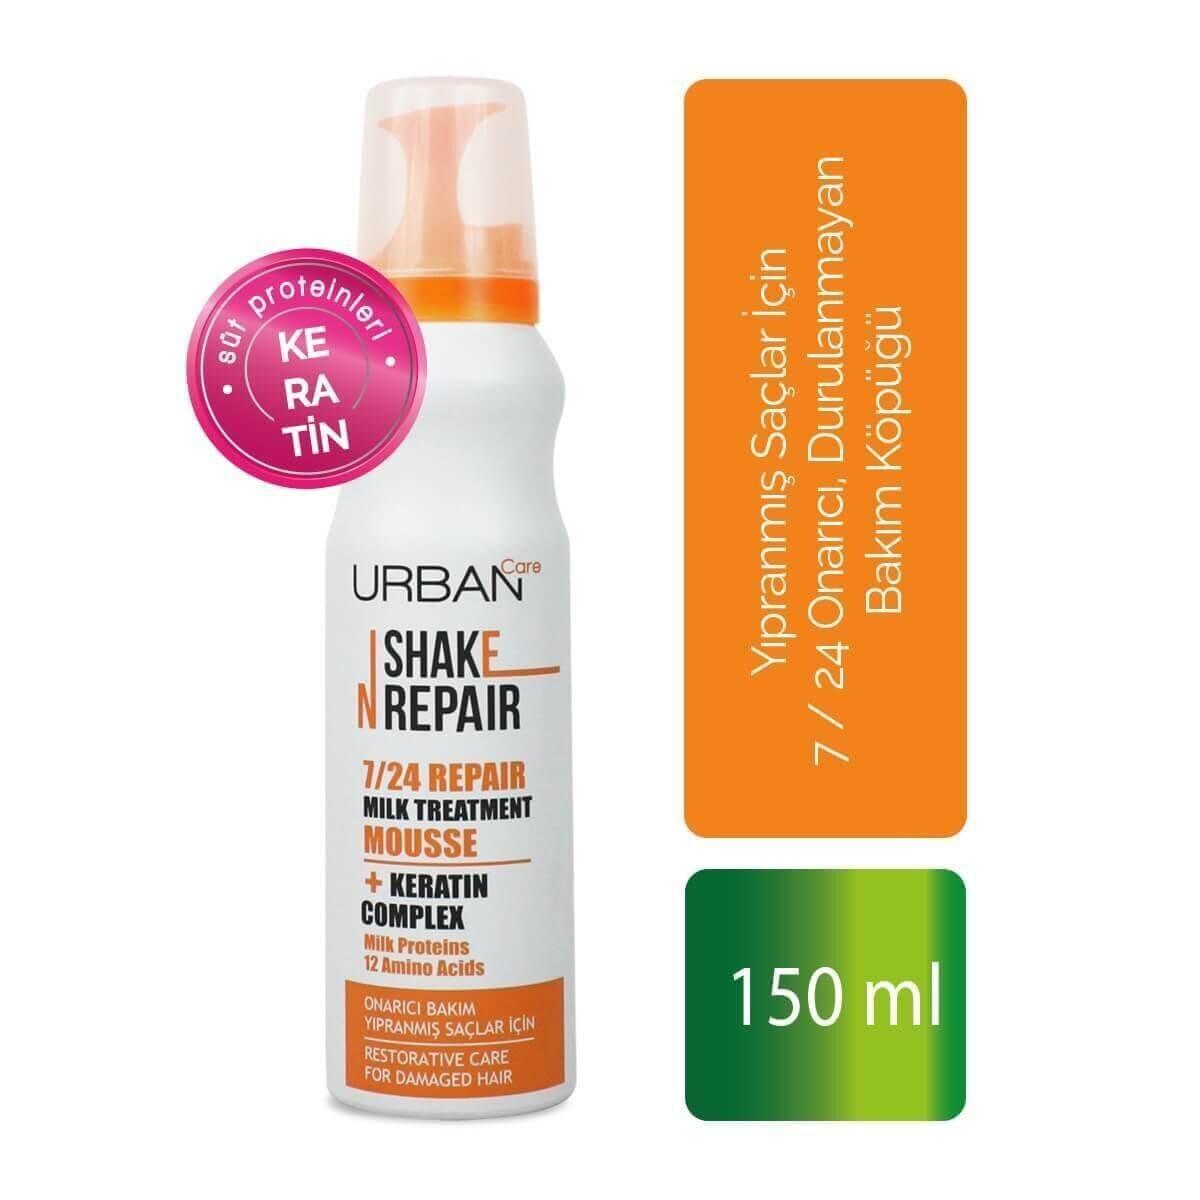 7/24 Shake Repair Milk Treatment Saç bakım Köpüğü 150ml